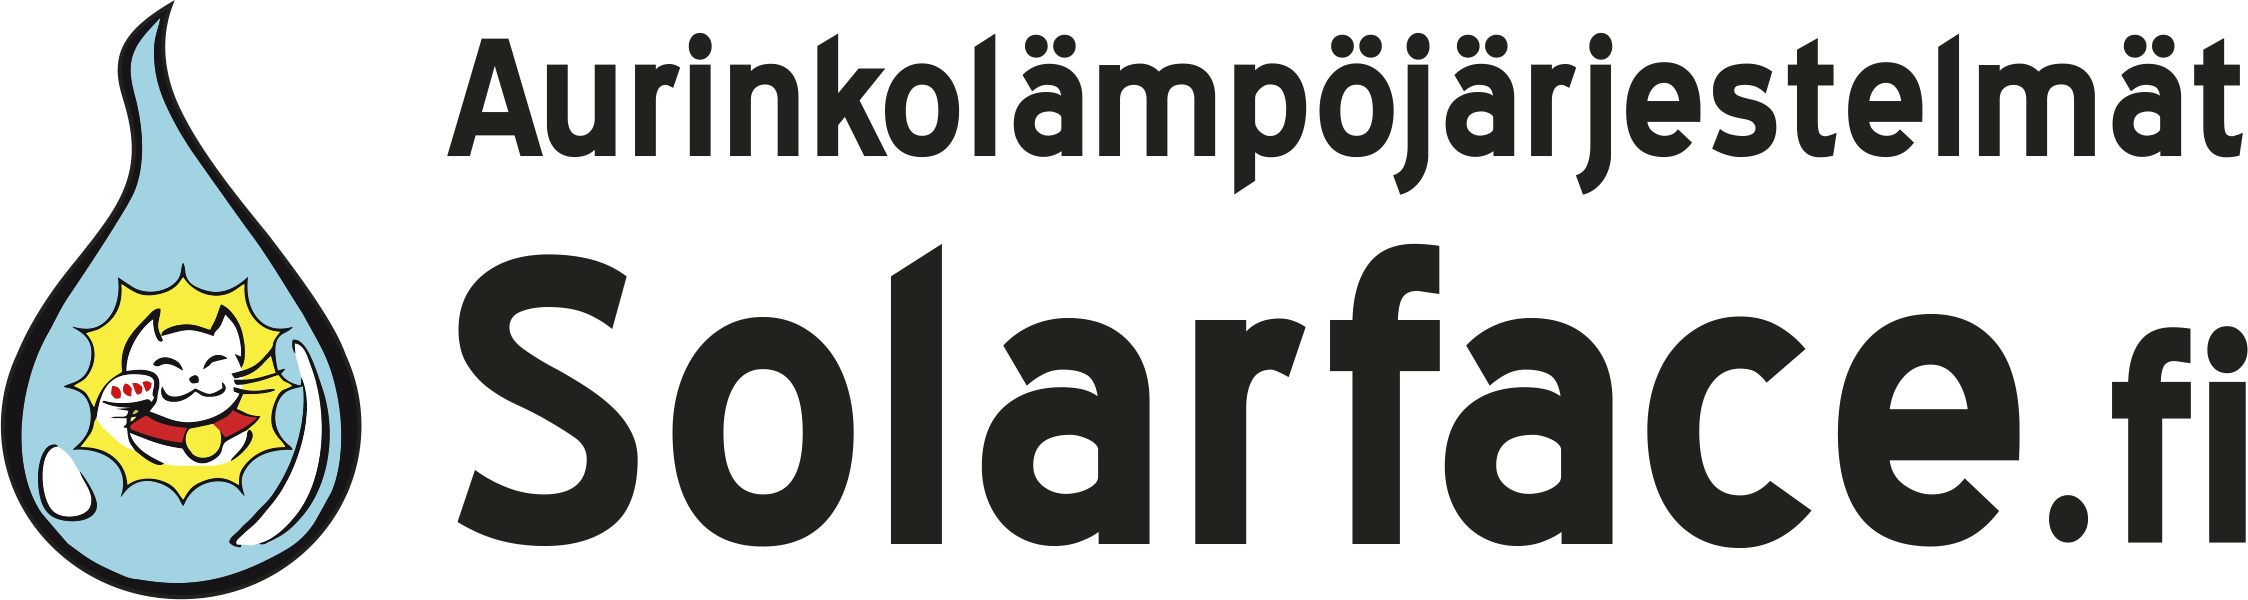 Solarface